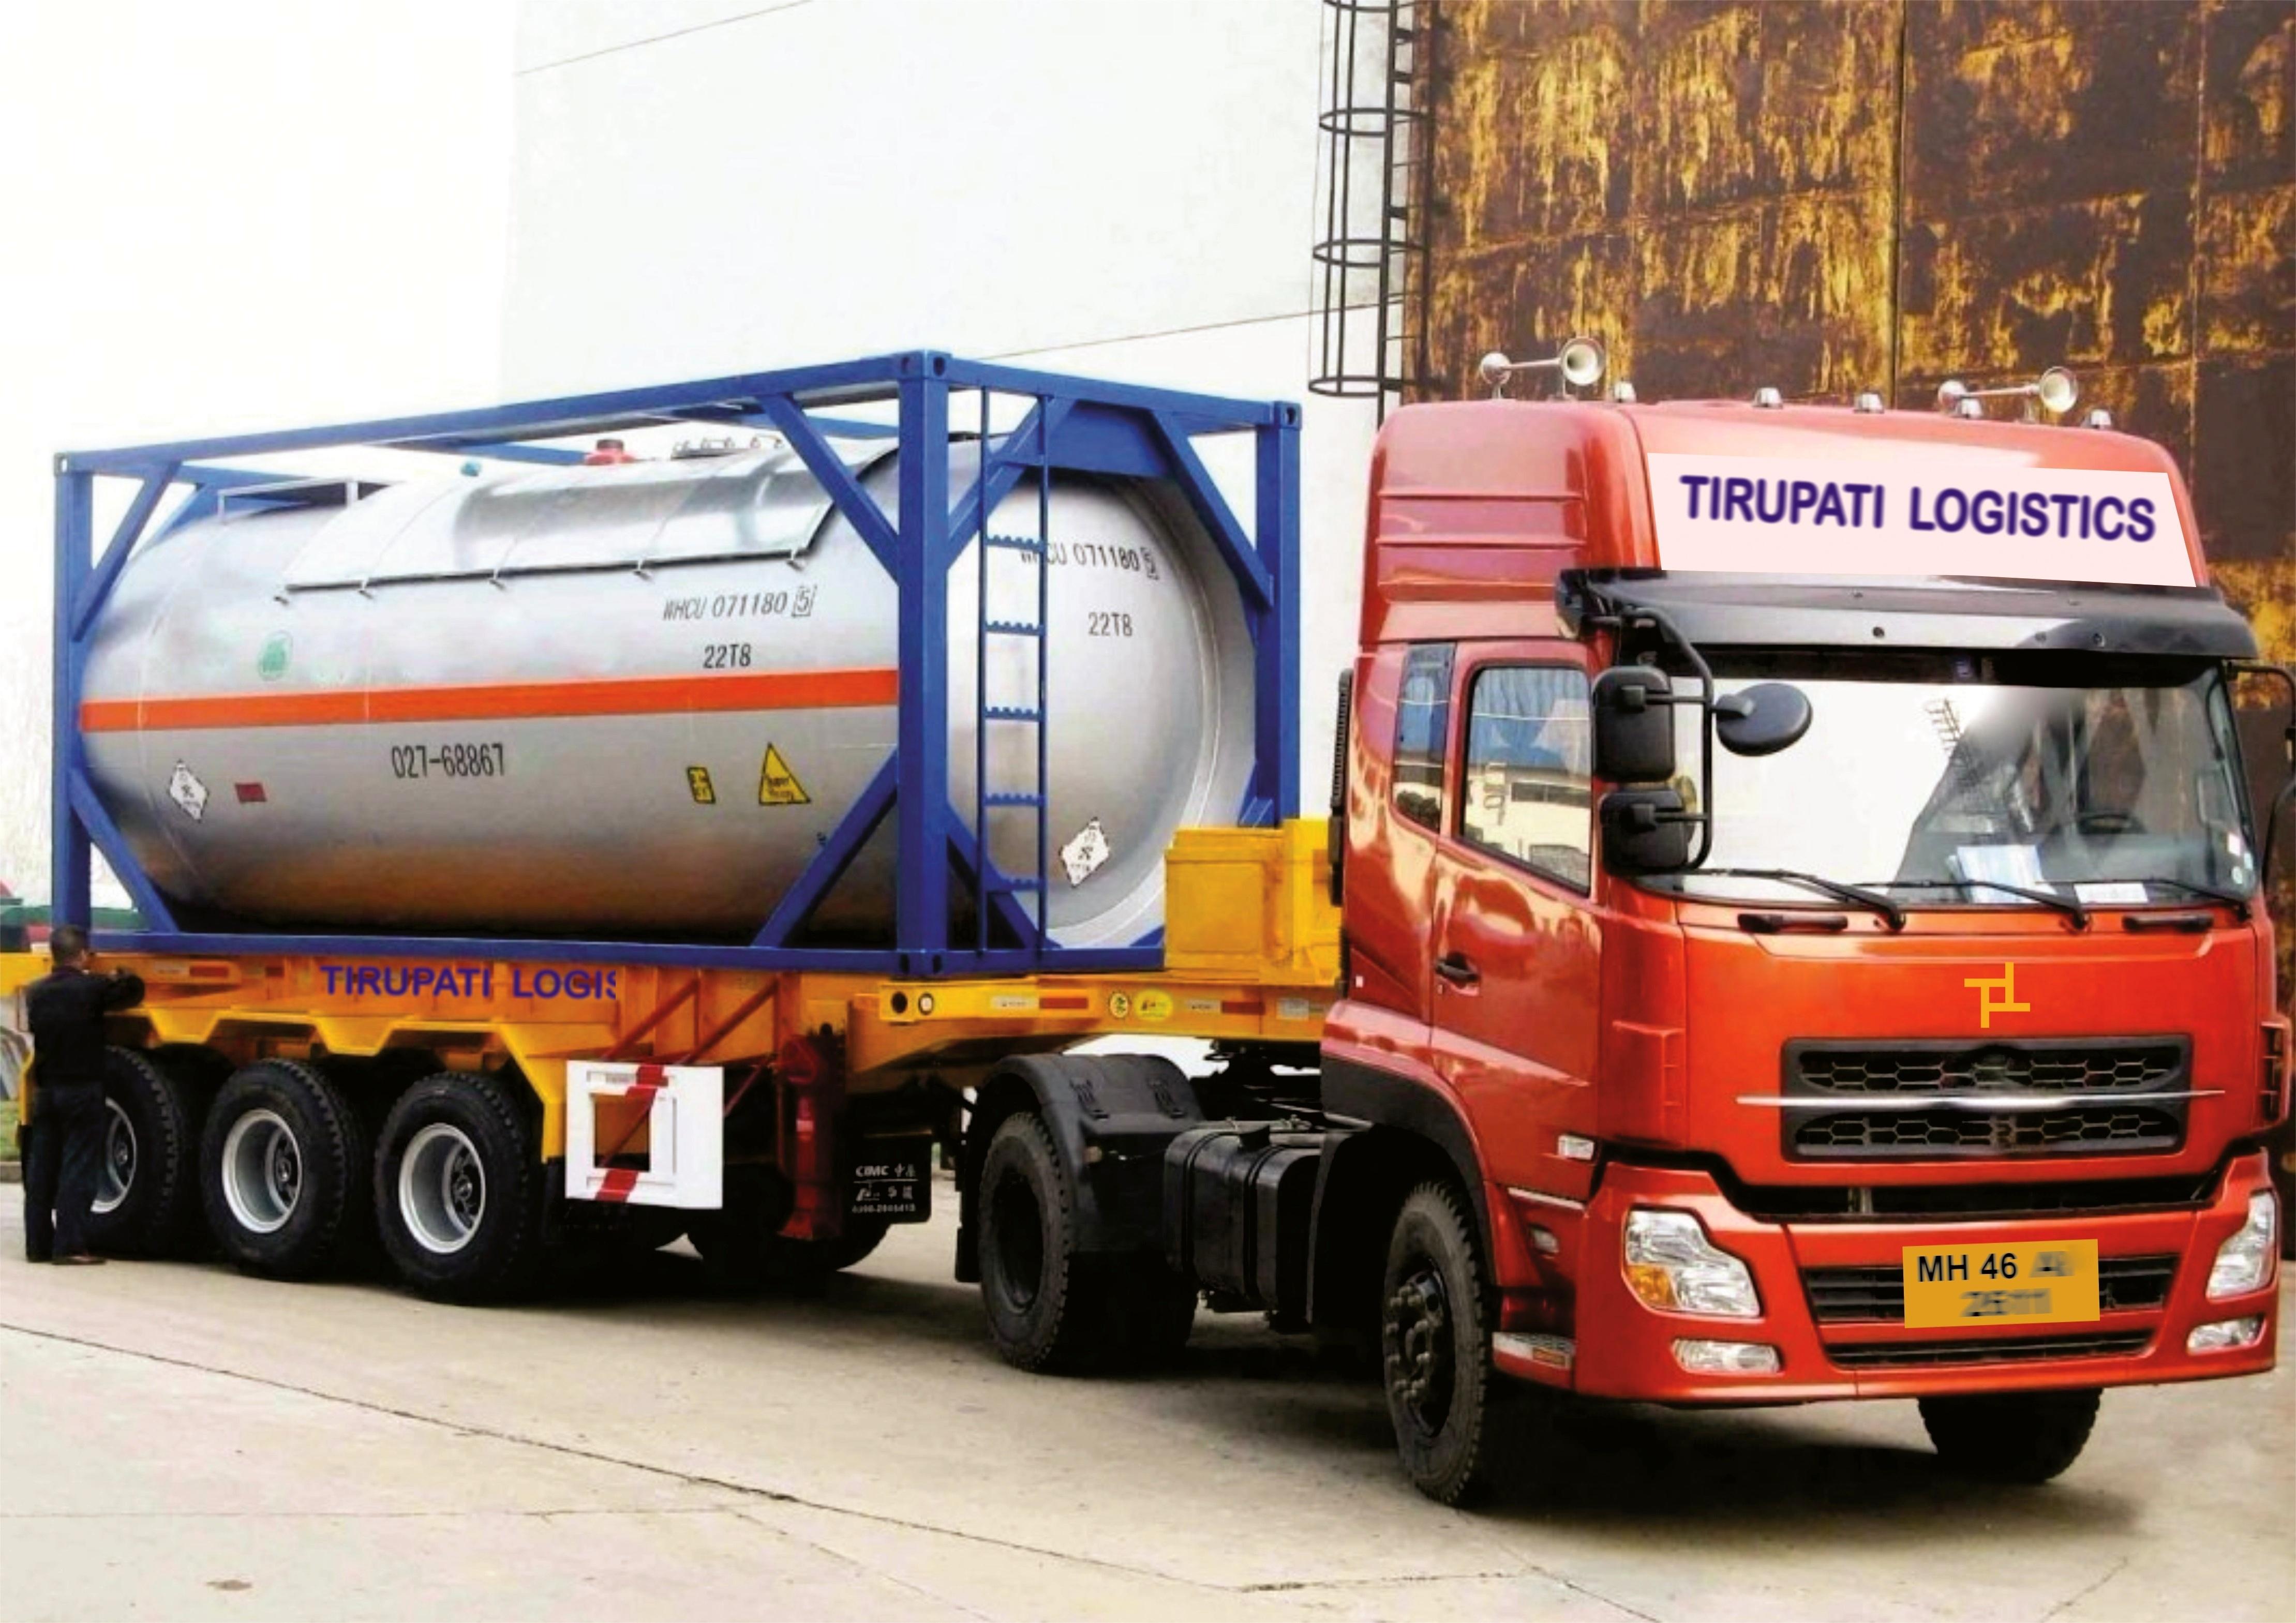 Tirupati Logistics ISO Tank